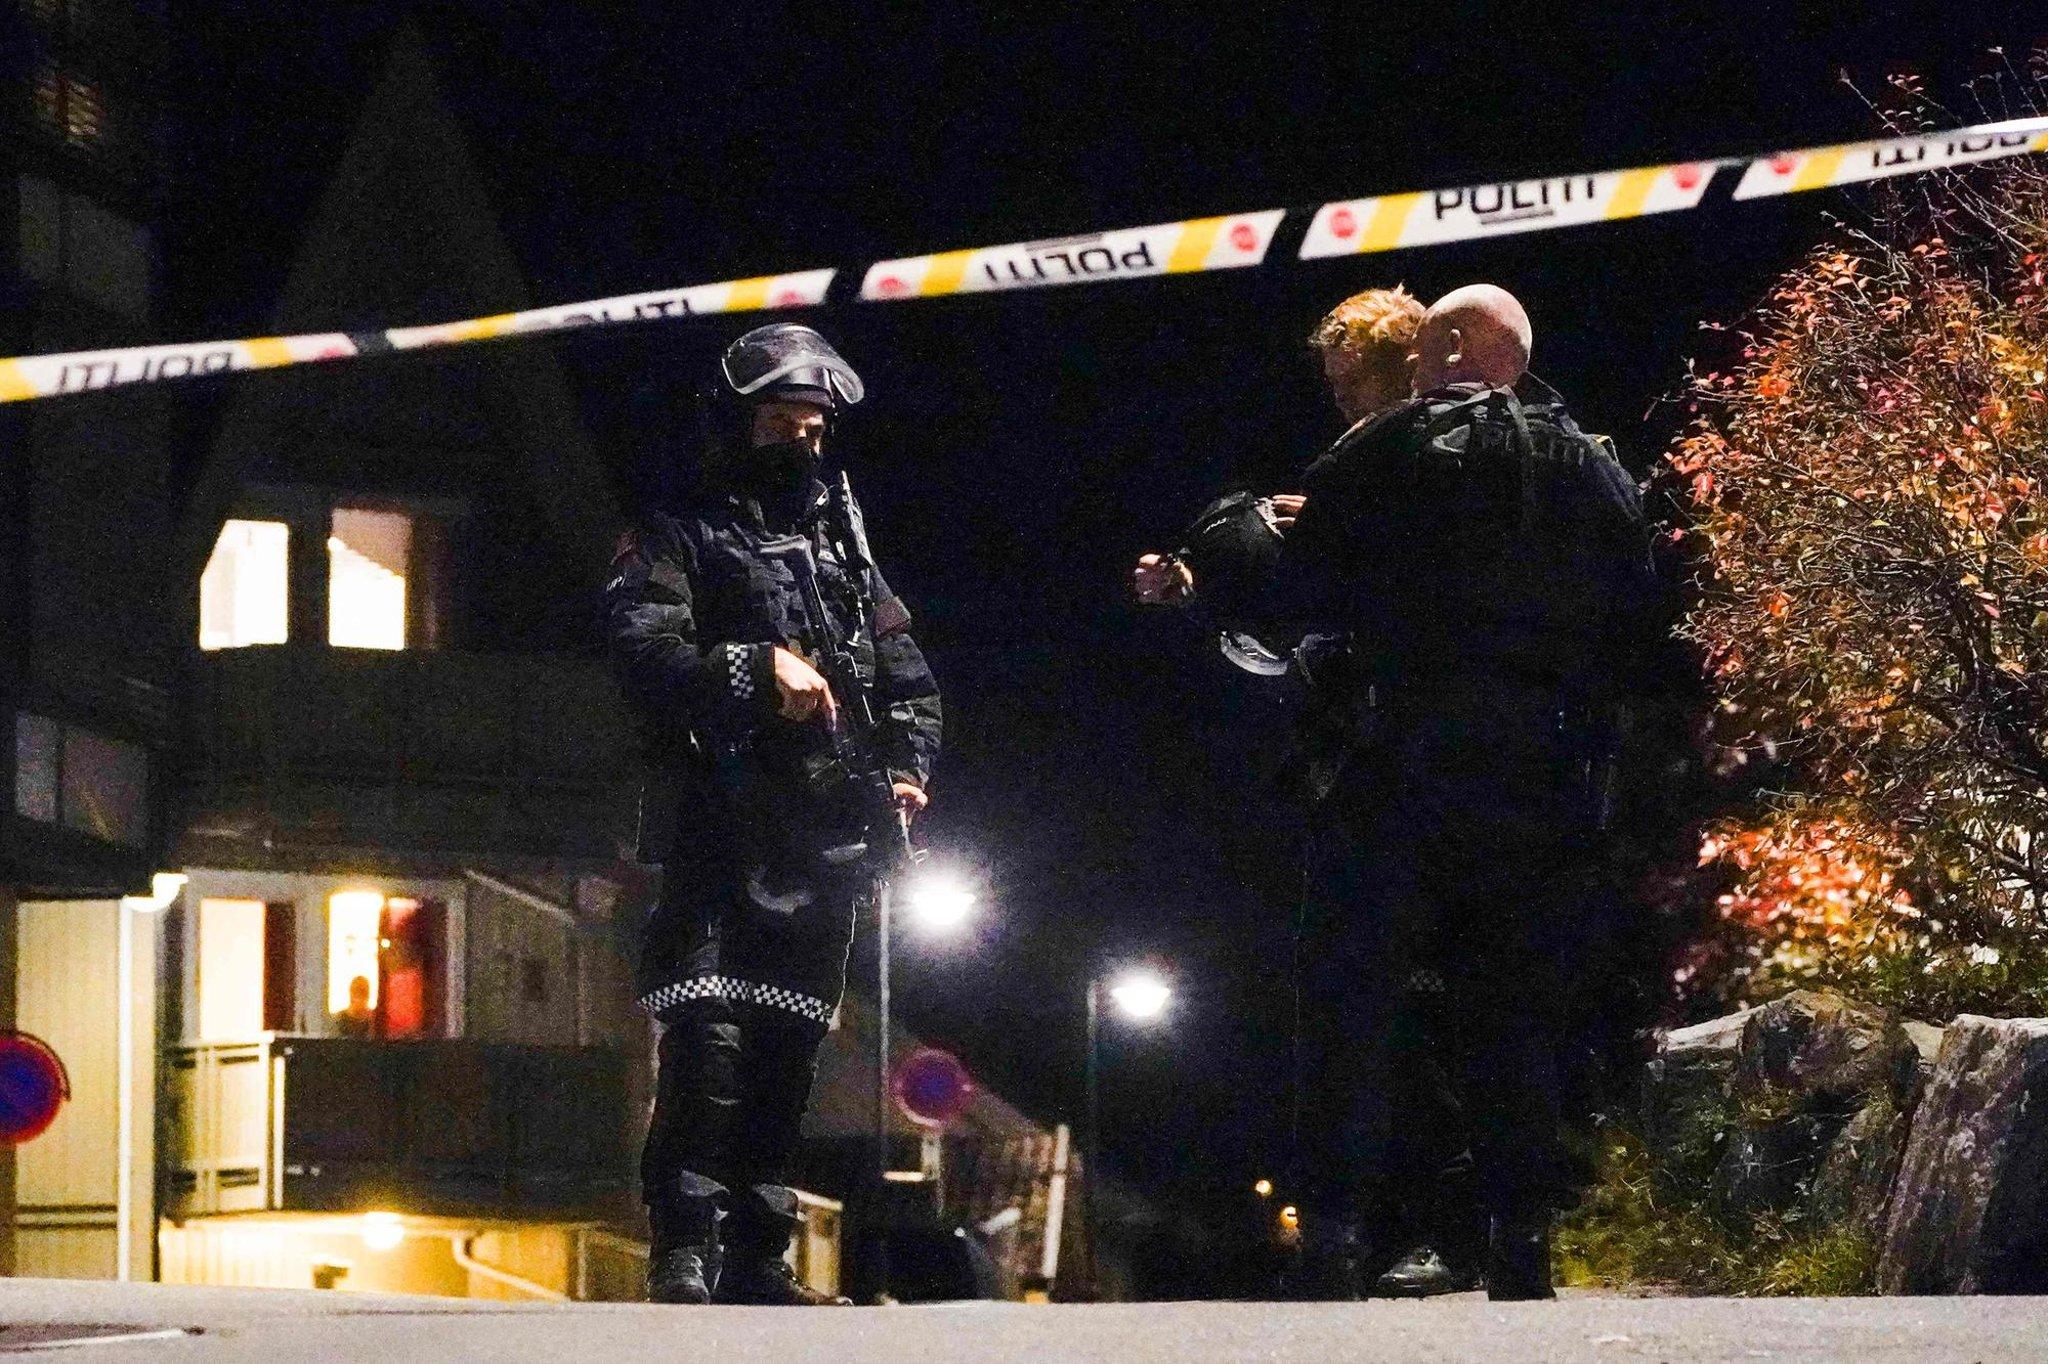 Serangan Norwegia: 'Beberapa terluka dan mati' dalam serangan oleh pria dengan busur dan anak panah di kota Kongsberg